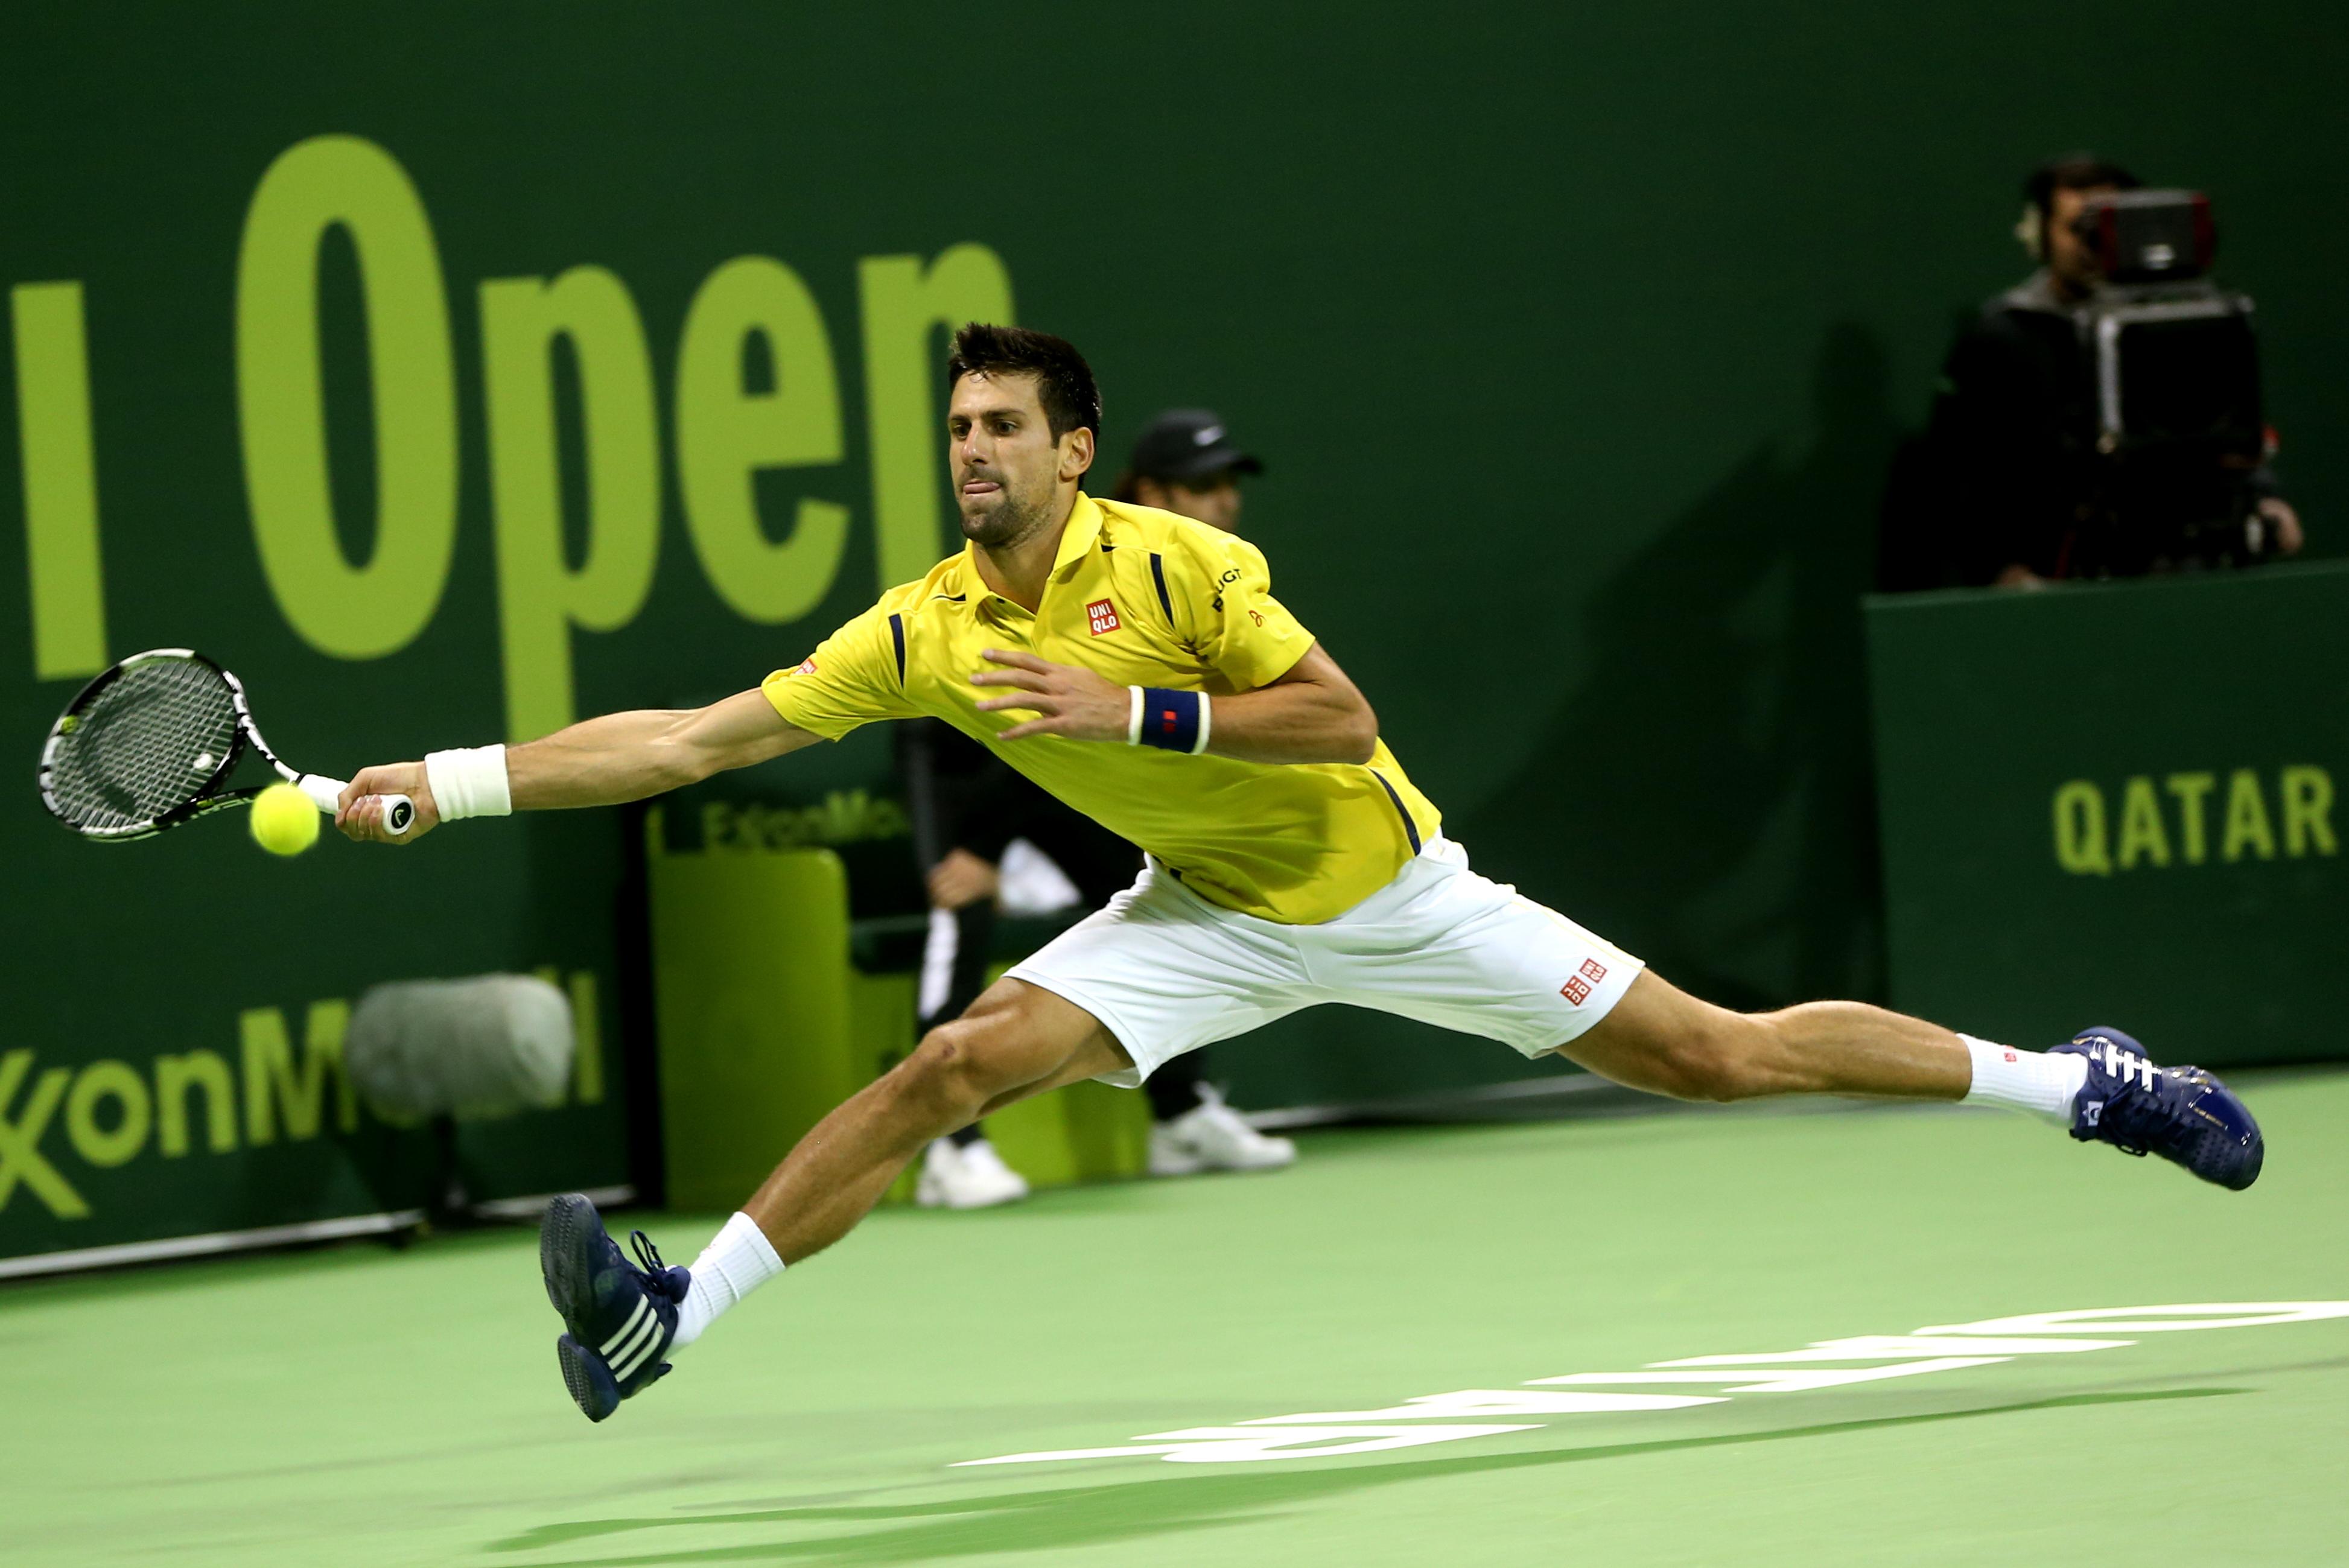 Novak_Djokovic,_Qatar_Open_2016